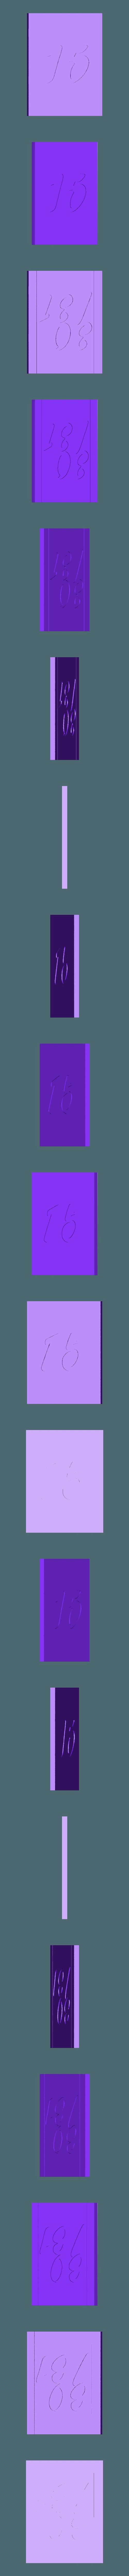 15_-_30-31.stl Download free SCAD file Perpetual Flip Calendar (W/ Customizable Font) • 3D printable model, Dsk